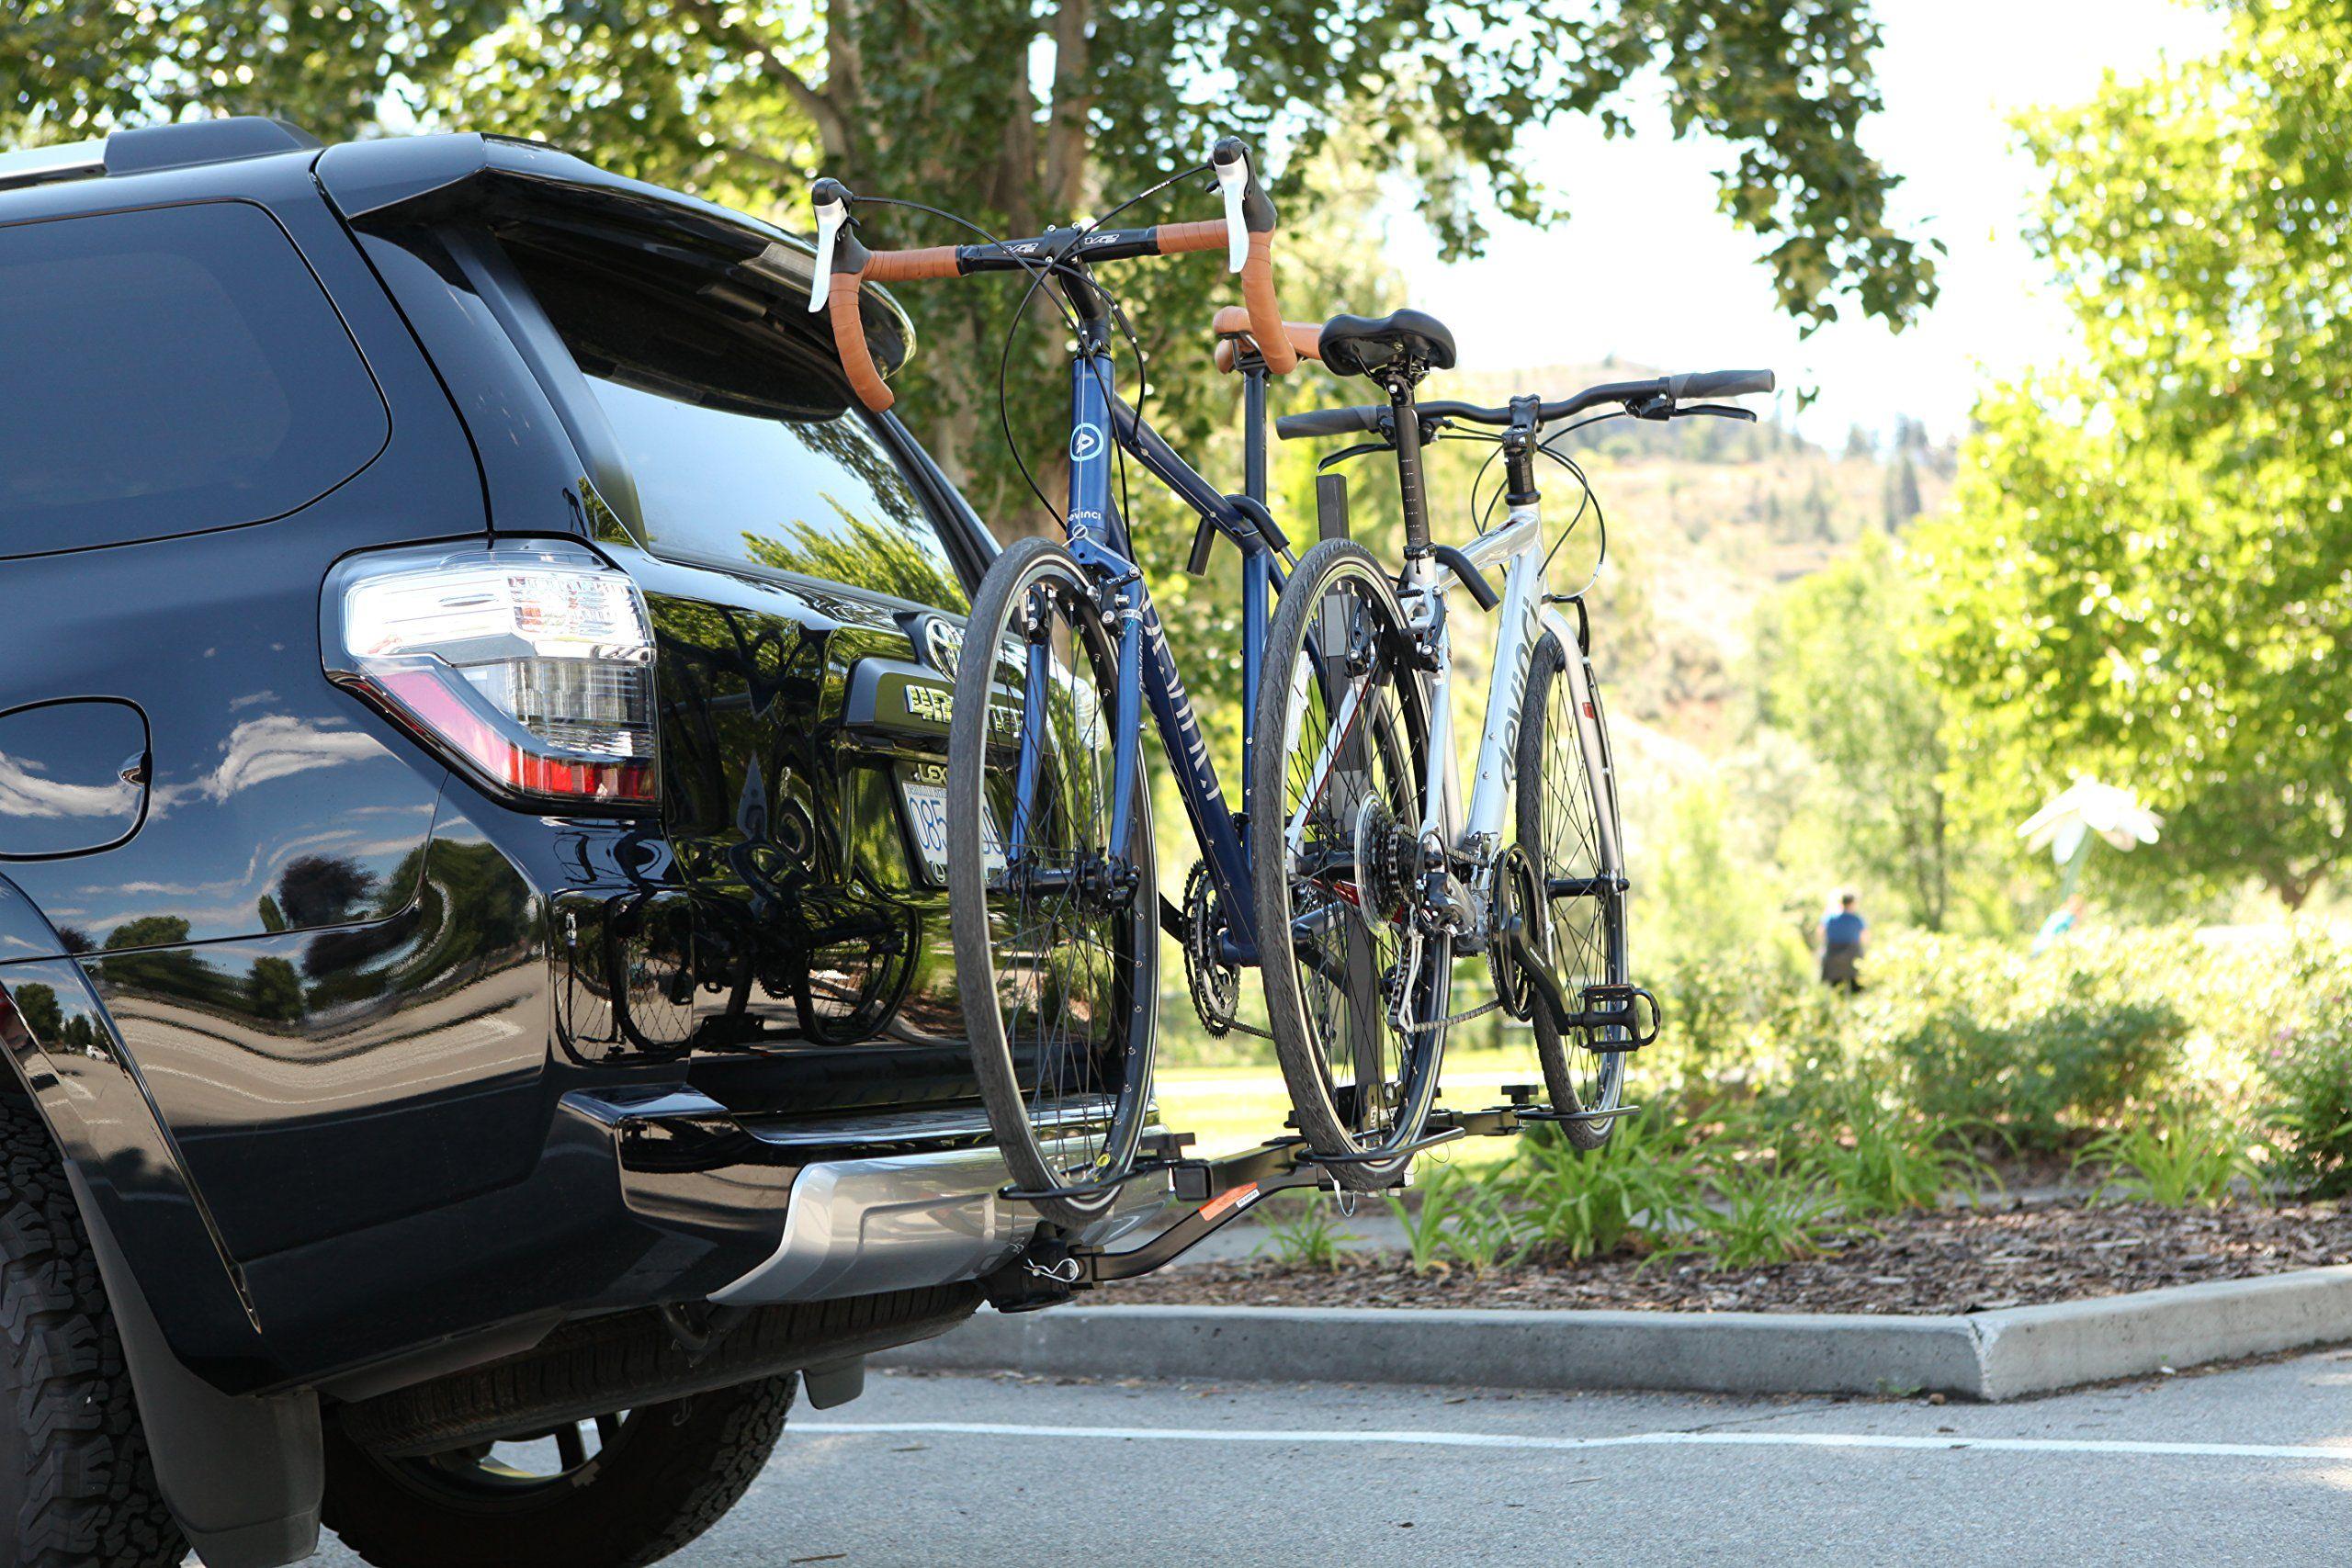 Swagman Xc Crosscountry 2bike Hitch Mount Rack 1 1 4 And 2inch